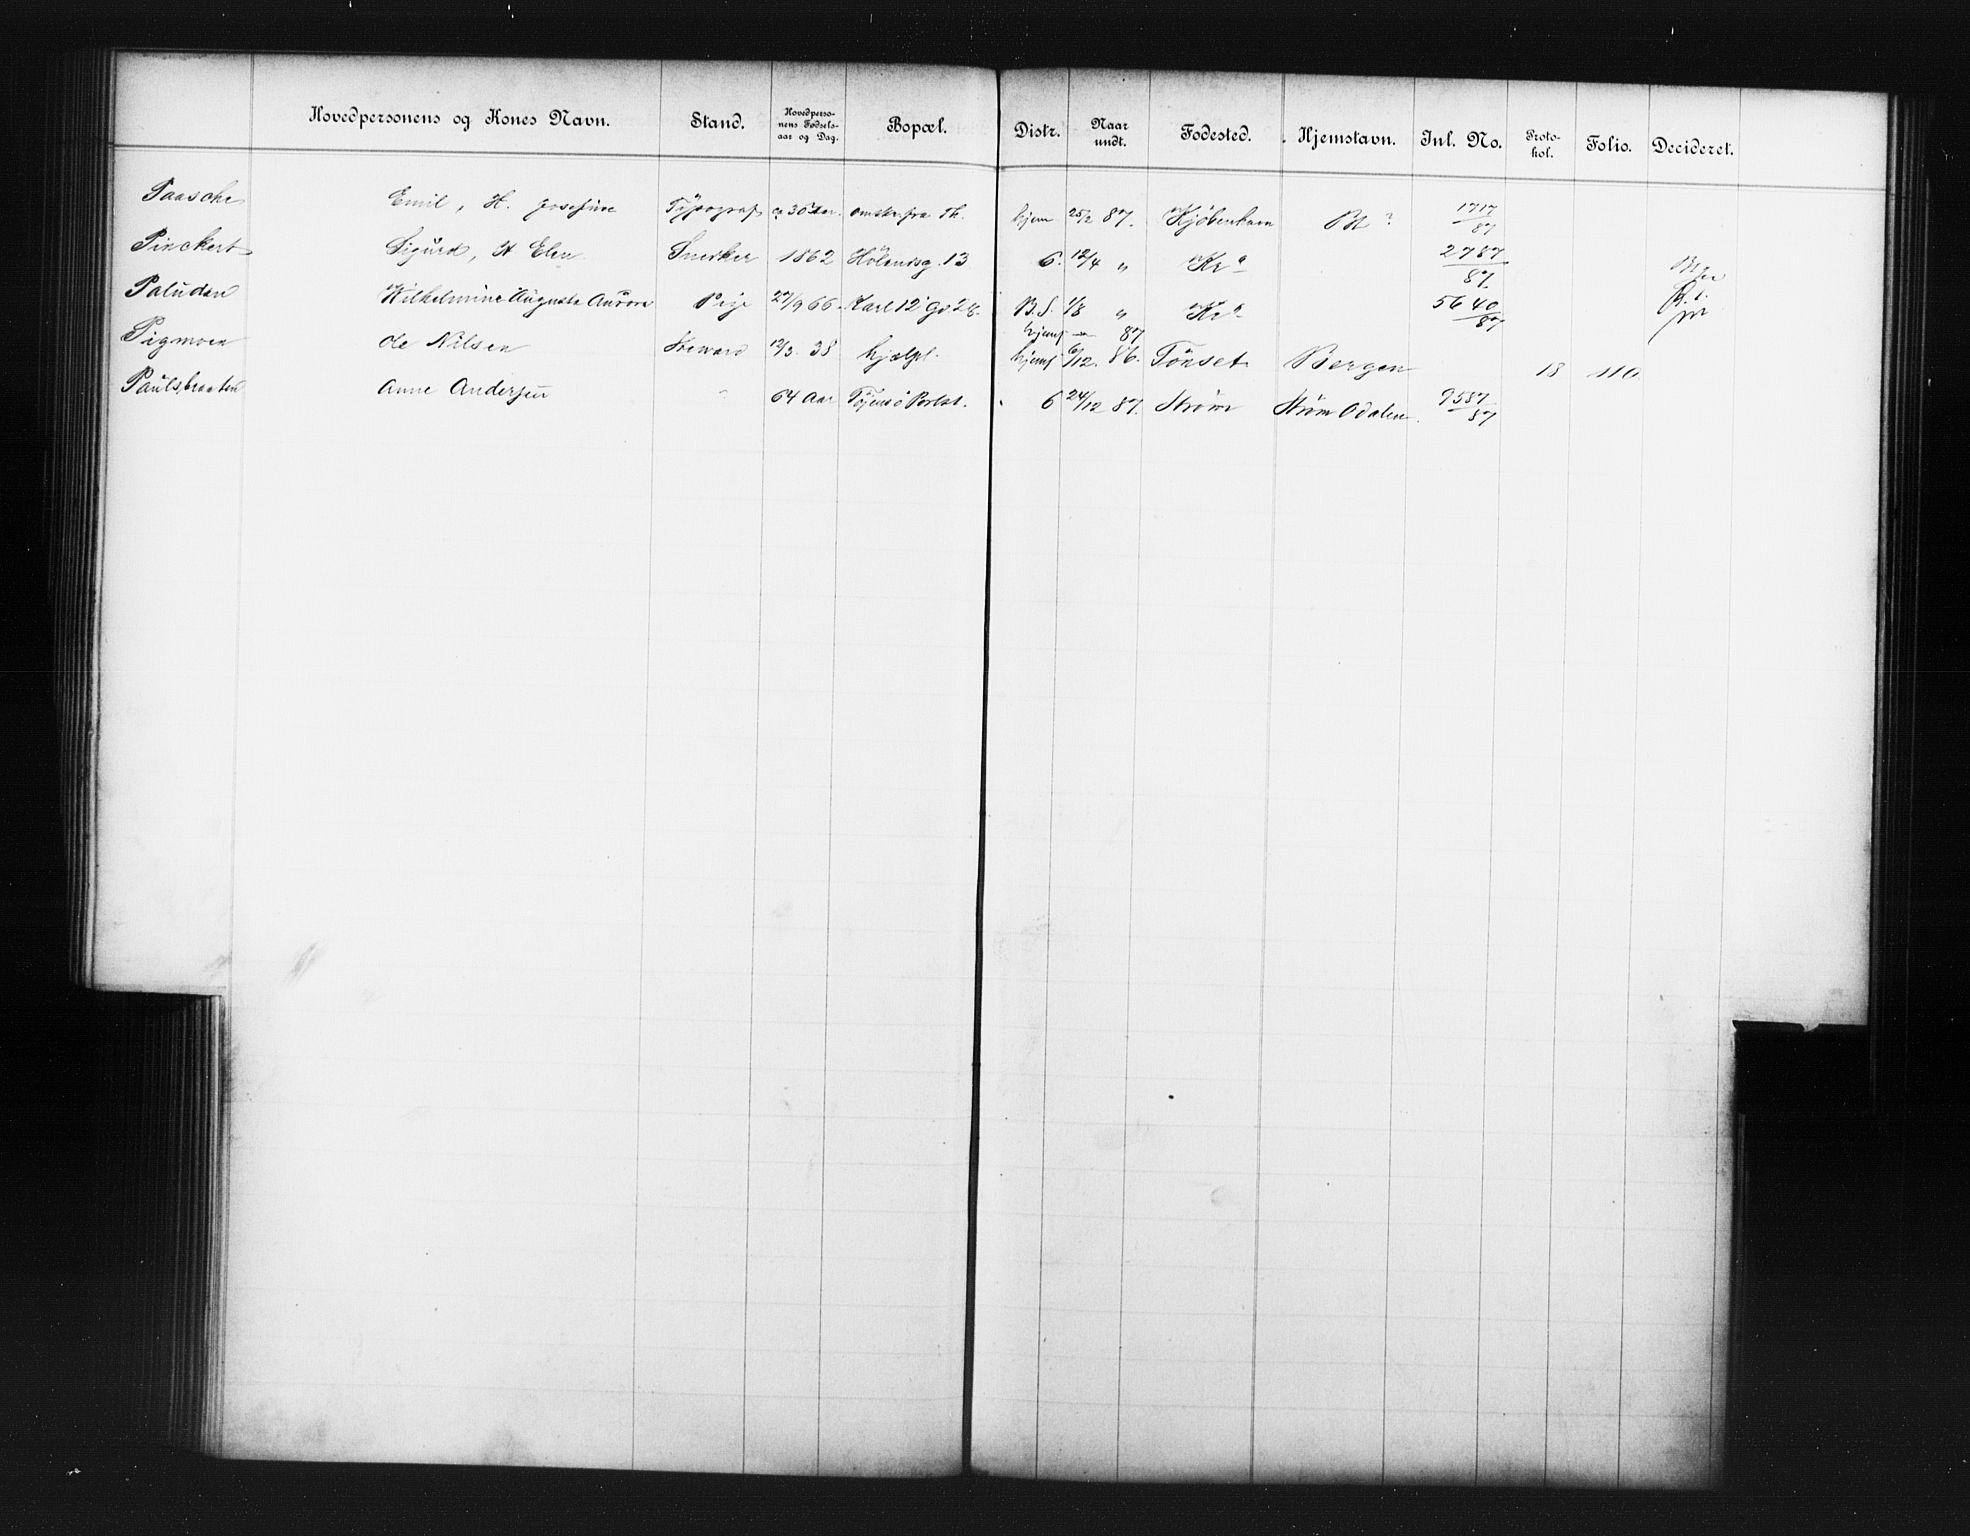 OBA, Fattigvesenet, Fb/L0007: Hjemstavnsregister, 1887, s. 159